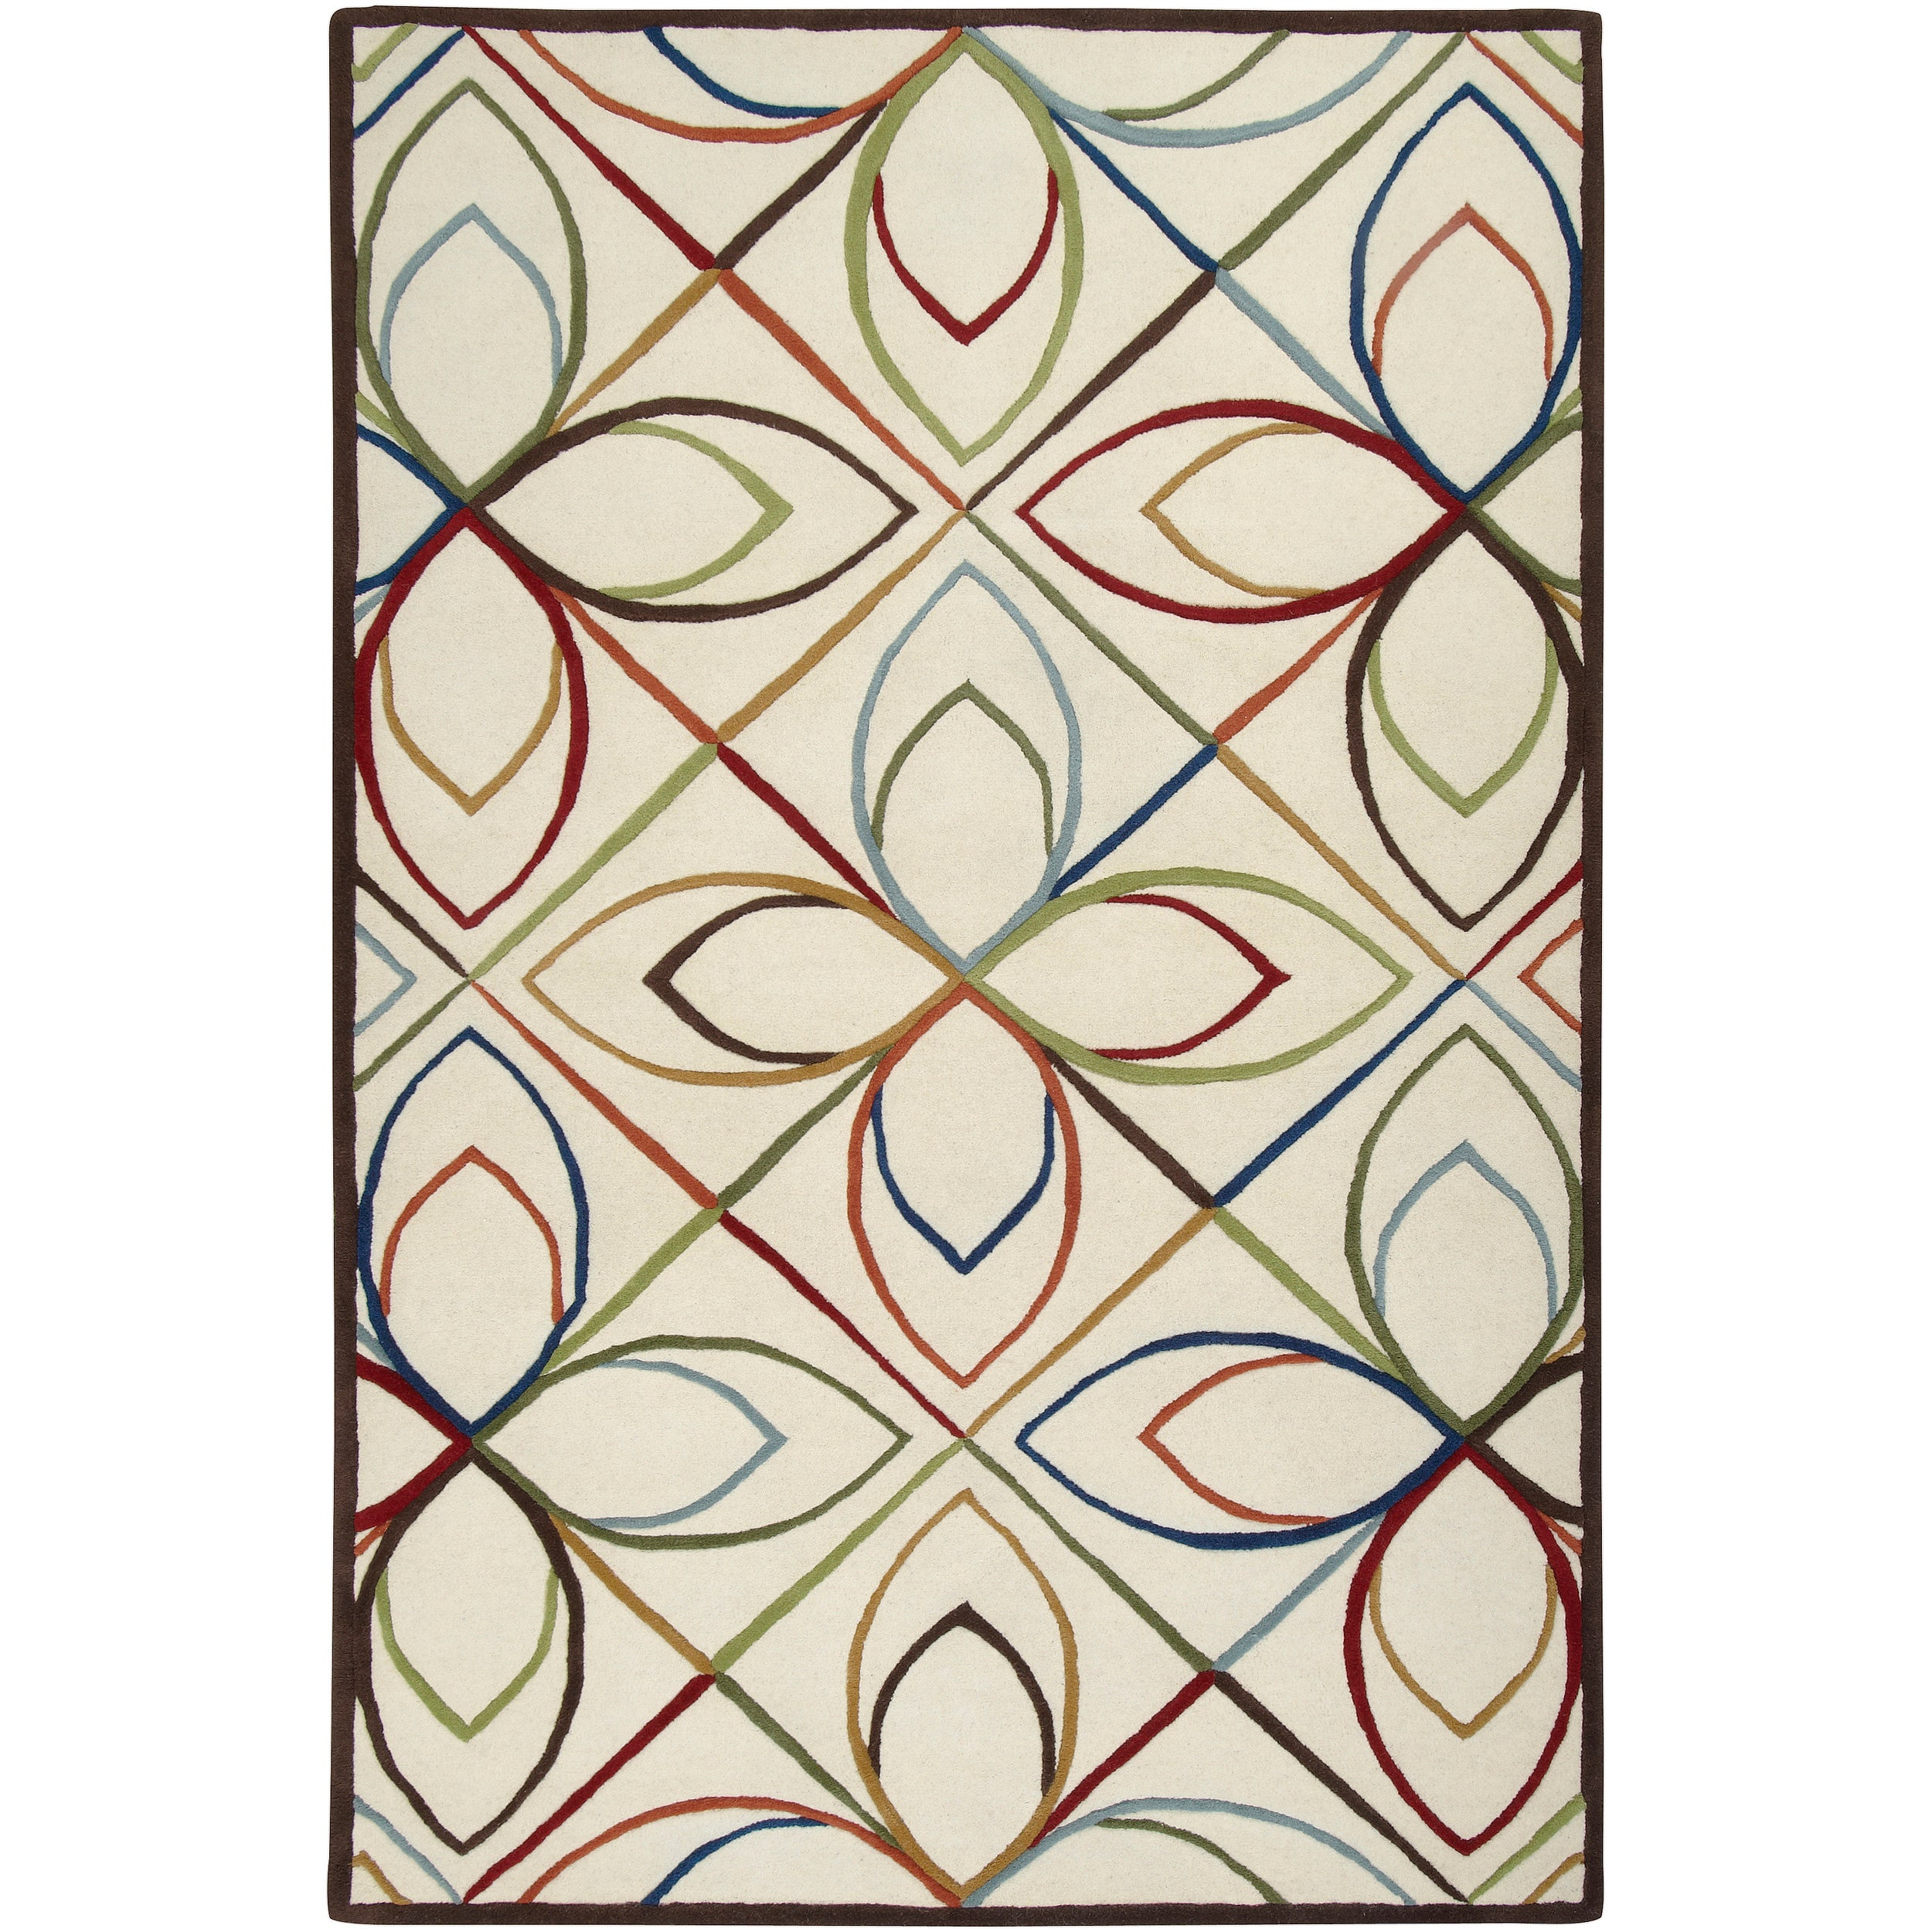 Hand-tufted Ivory Contemporary Littlehampton New Zealand Wool Geometric Rug (8' x 11')